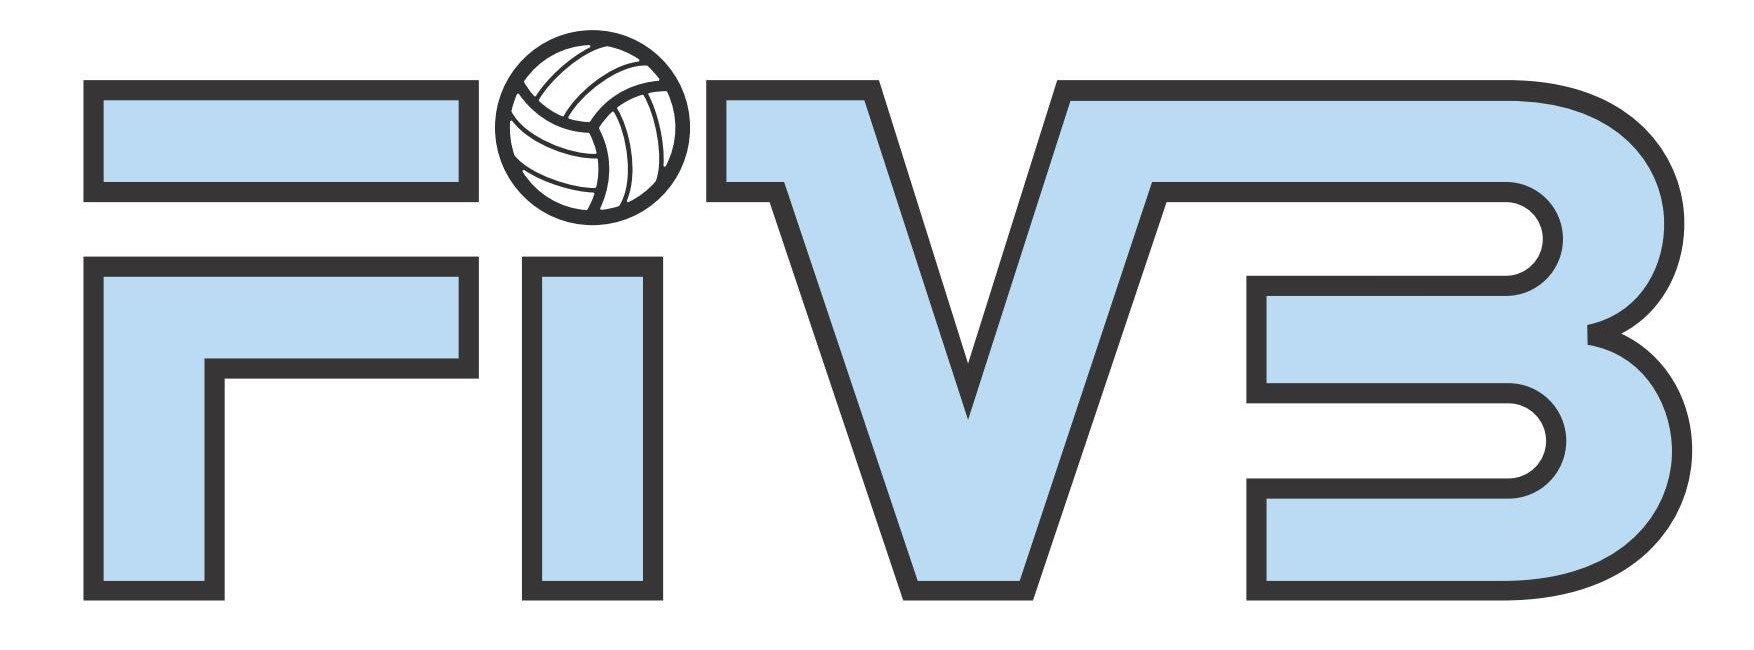 Fédération Internationale de Volleyball (FIVB) Logo png